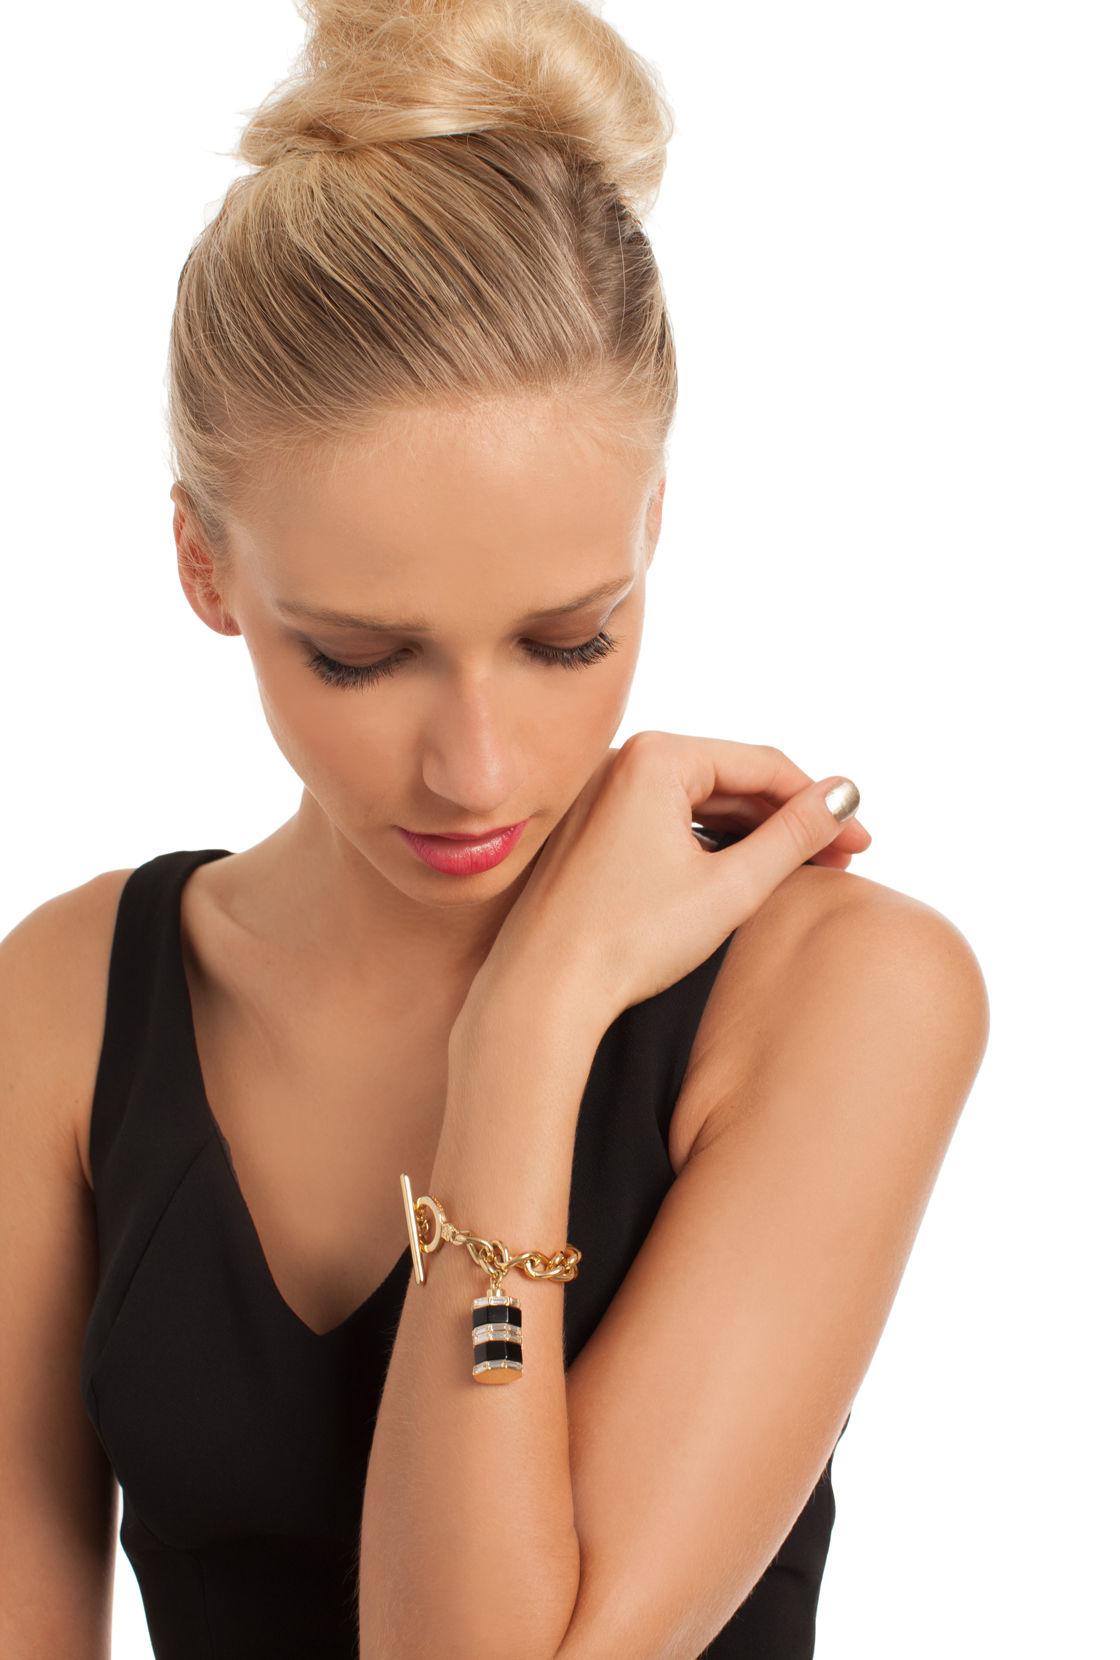 Trina Turk Color Charm On Curb Chain in Black (Metallic)